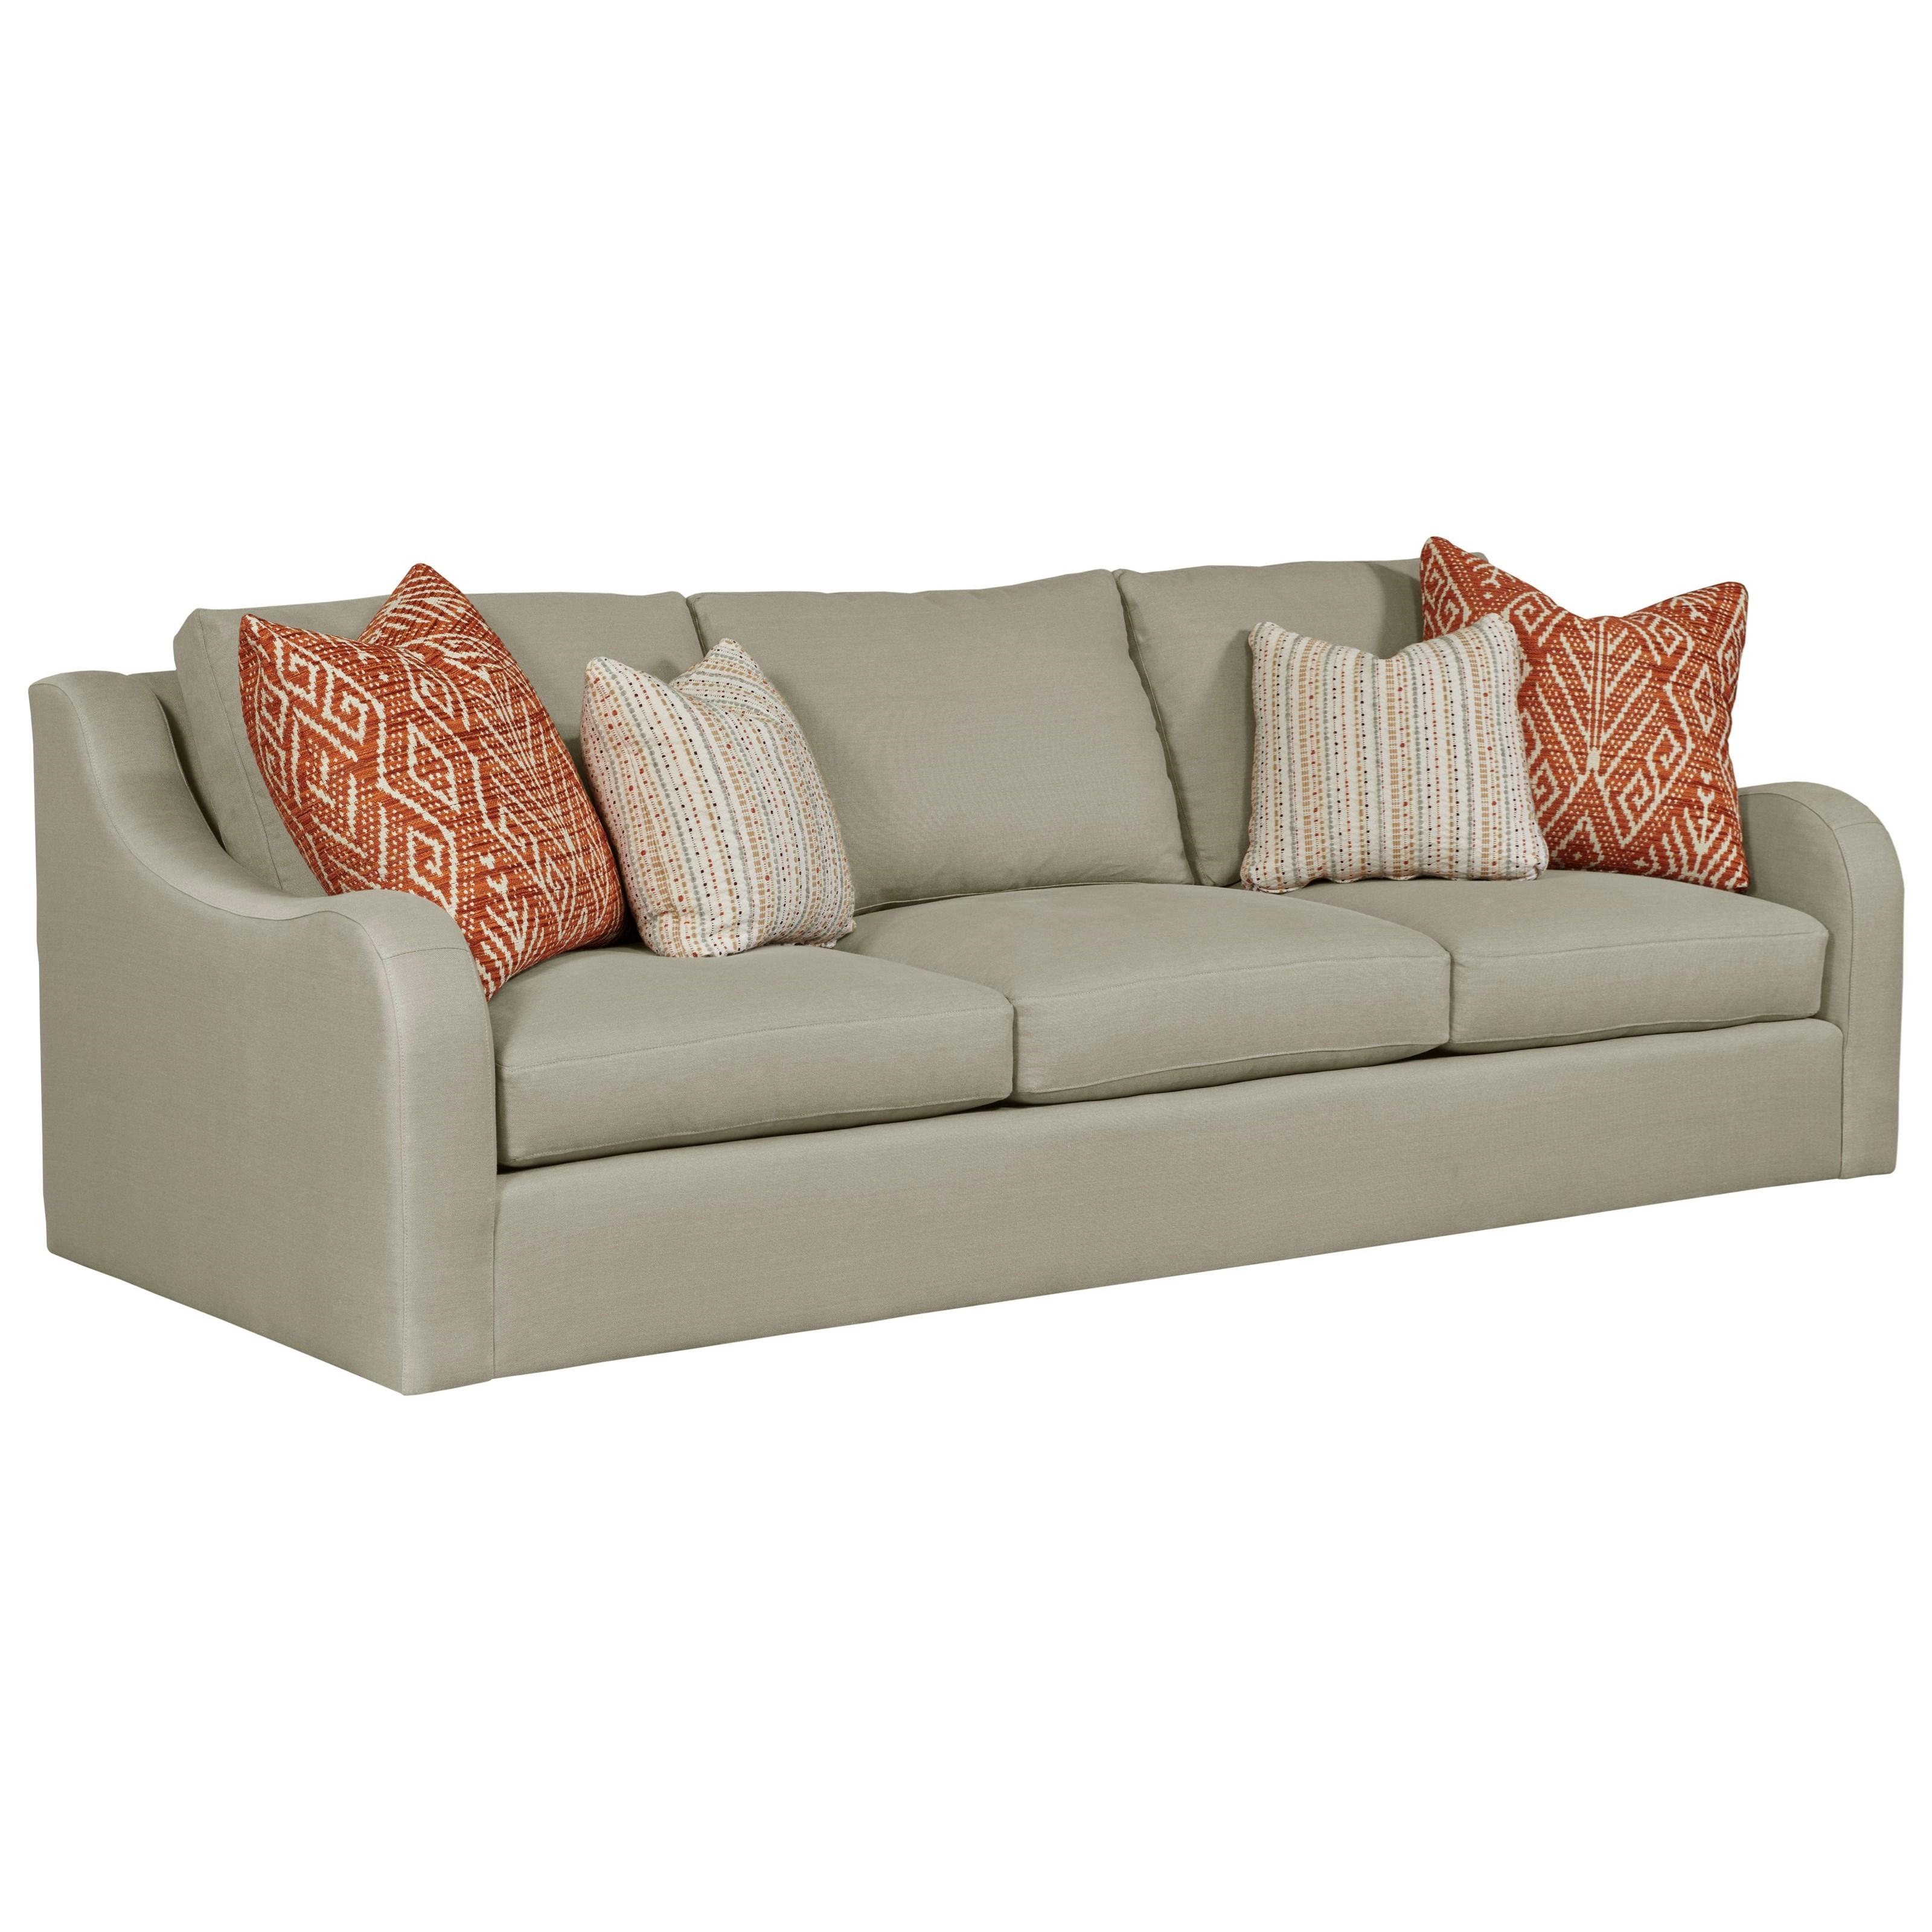 Comfort Select Grande Sofa by Kincaid Furniture at Johnny Janosik